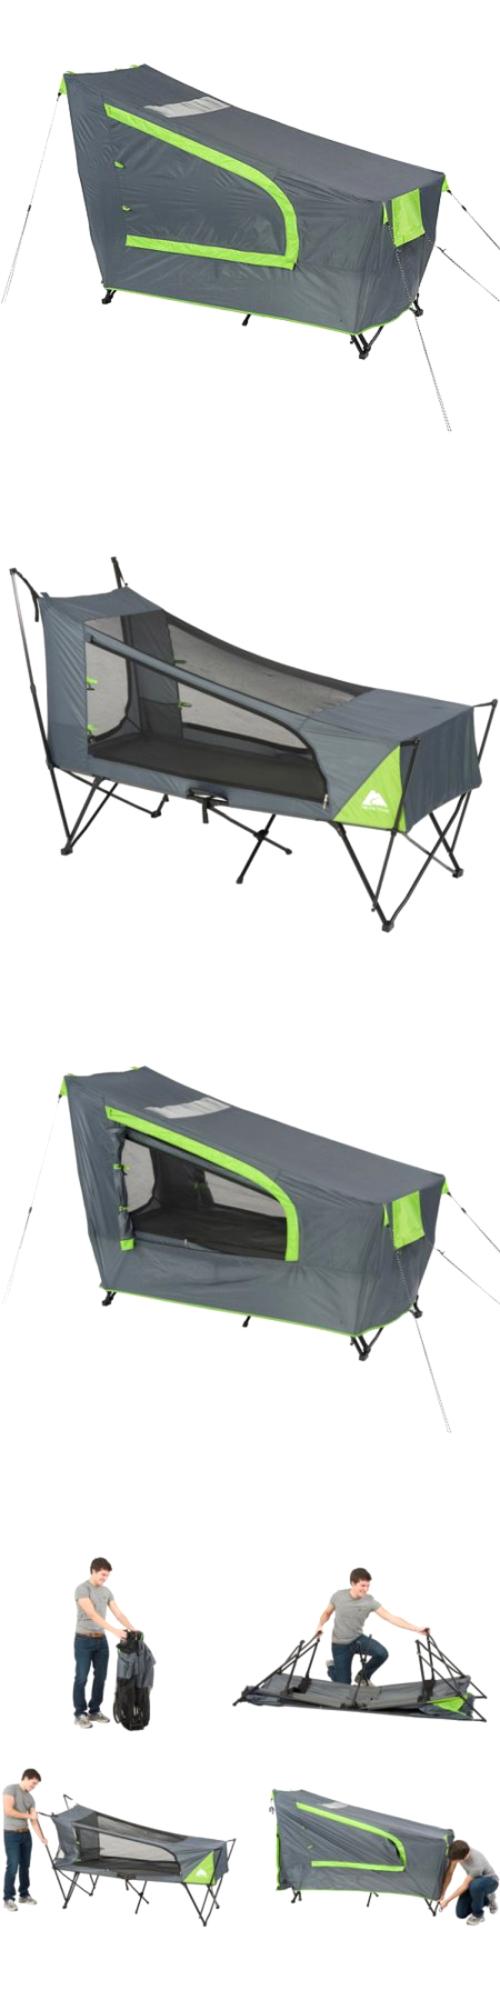 Tents 179010 Ozark Trail Instant Tent Cot With Rainfly Sleeps 1 -u003e BUY  sc 1 st  Pinterest & Tents 179010: Ozark Trail Instant Tent Cot With Rainfly Sleeps 1 ...